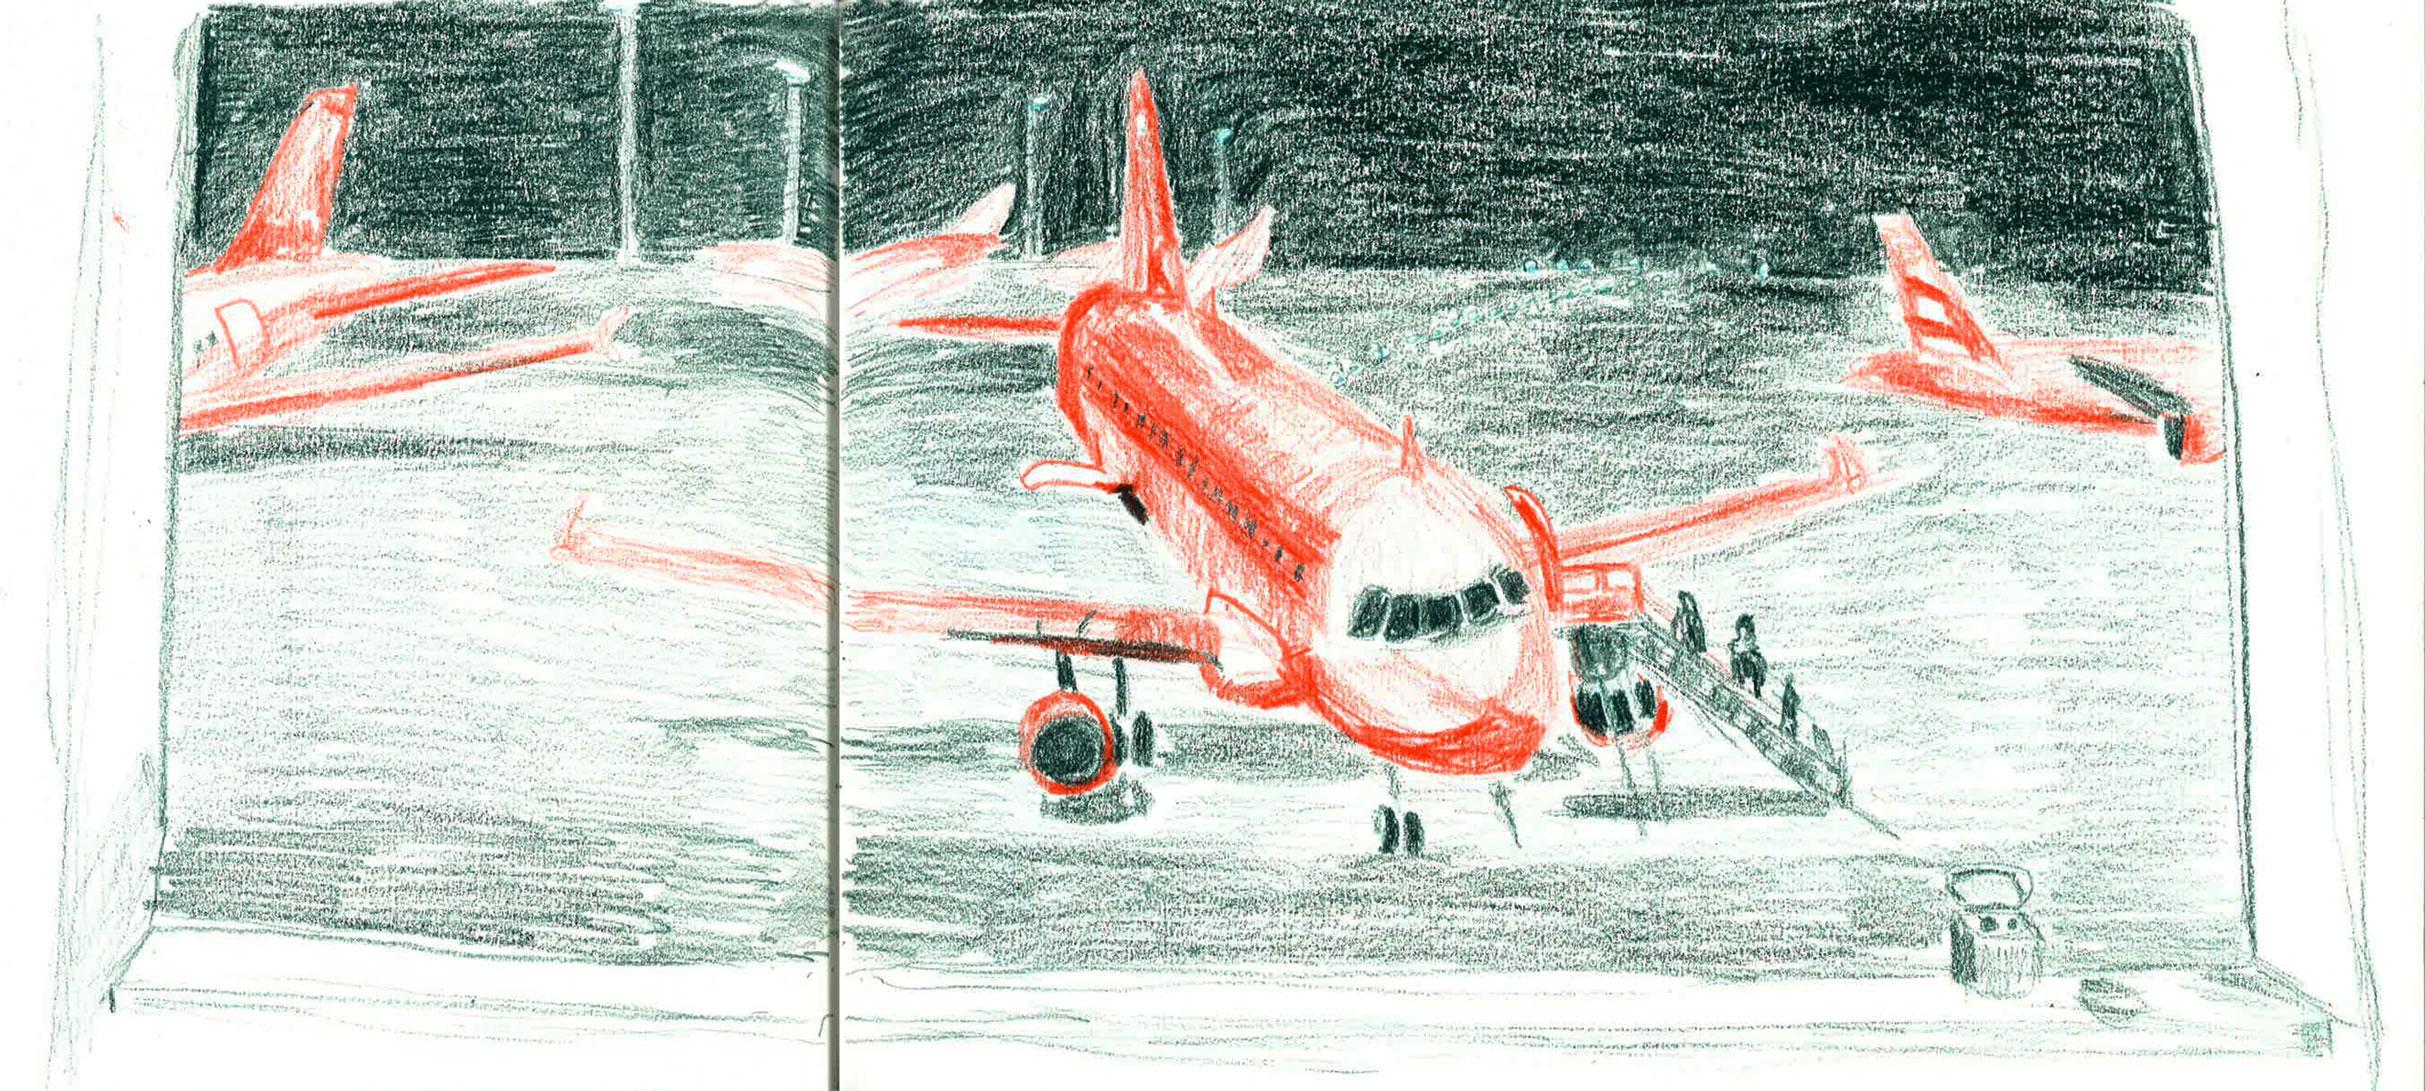 sketch at schiphol airport by ellen vesters ma childrens book illustration